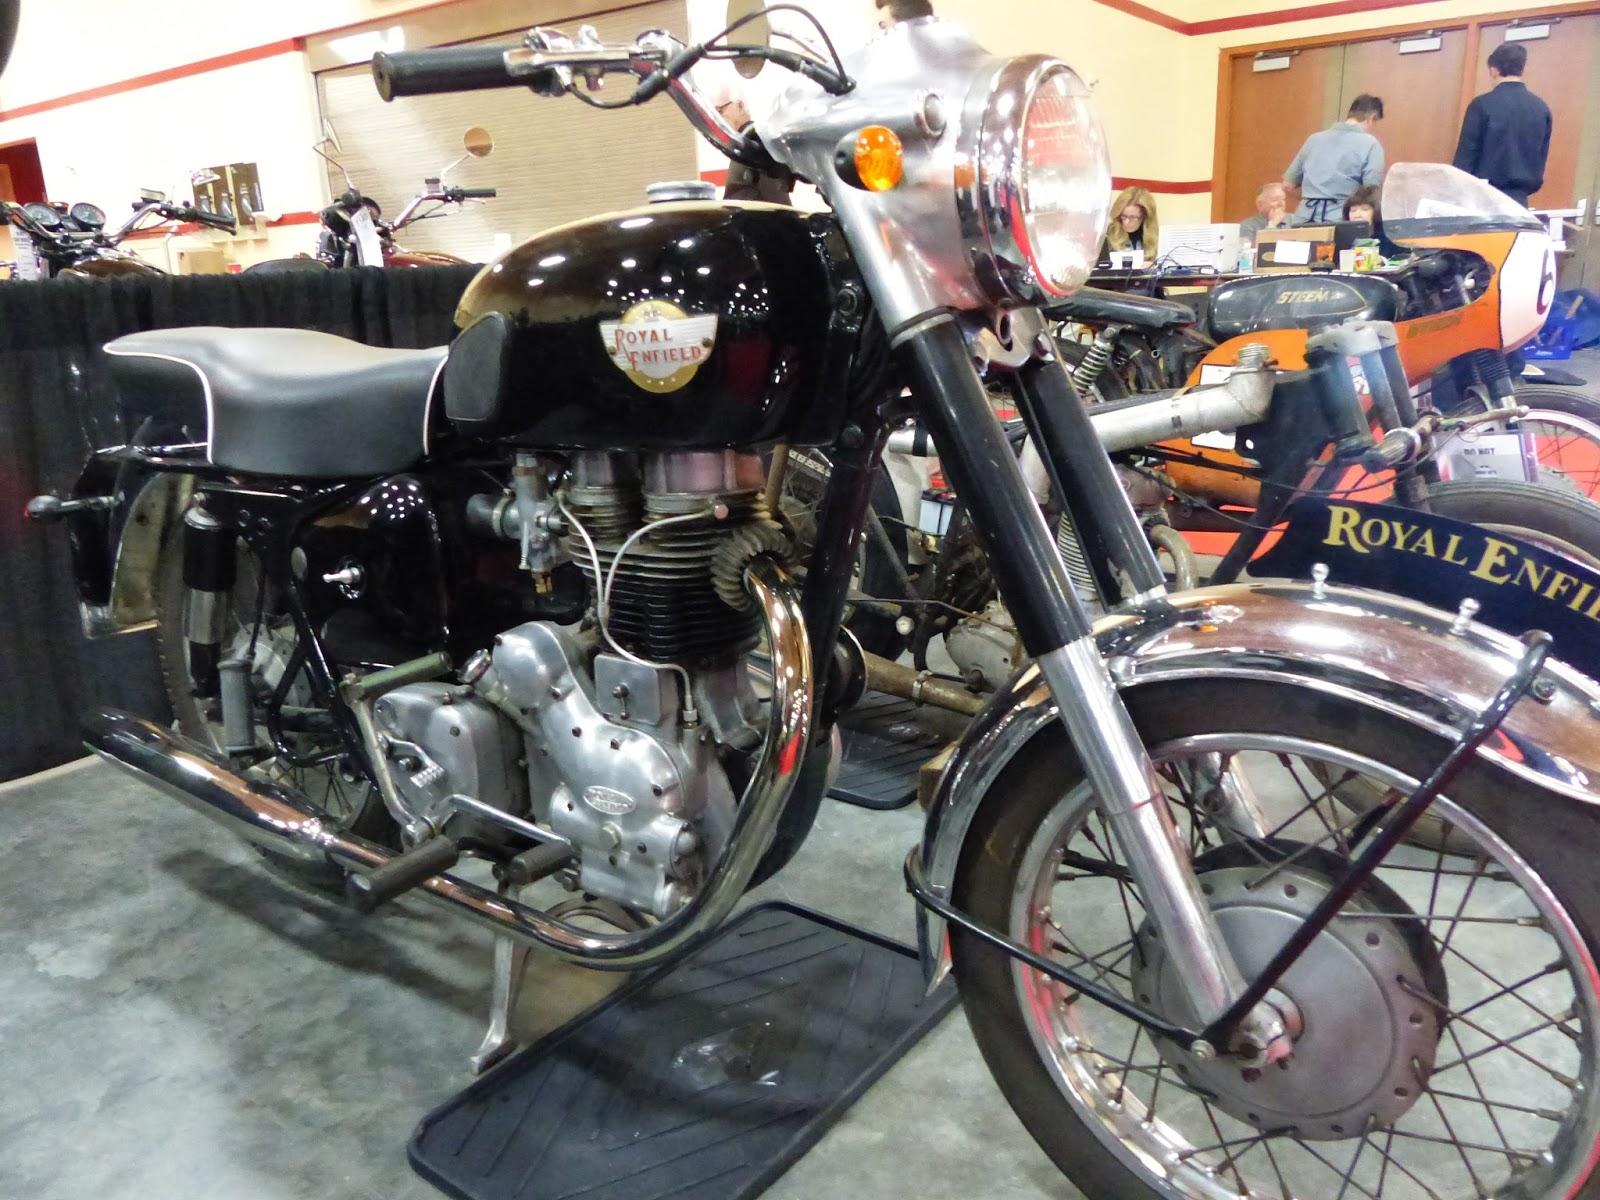 oldmotodude 1960 royal enfield 350 bullet for sale at the 2016 mecum las vegas motorcycle auction. Black Bedroom Furniture Sets. Home Design Ideas